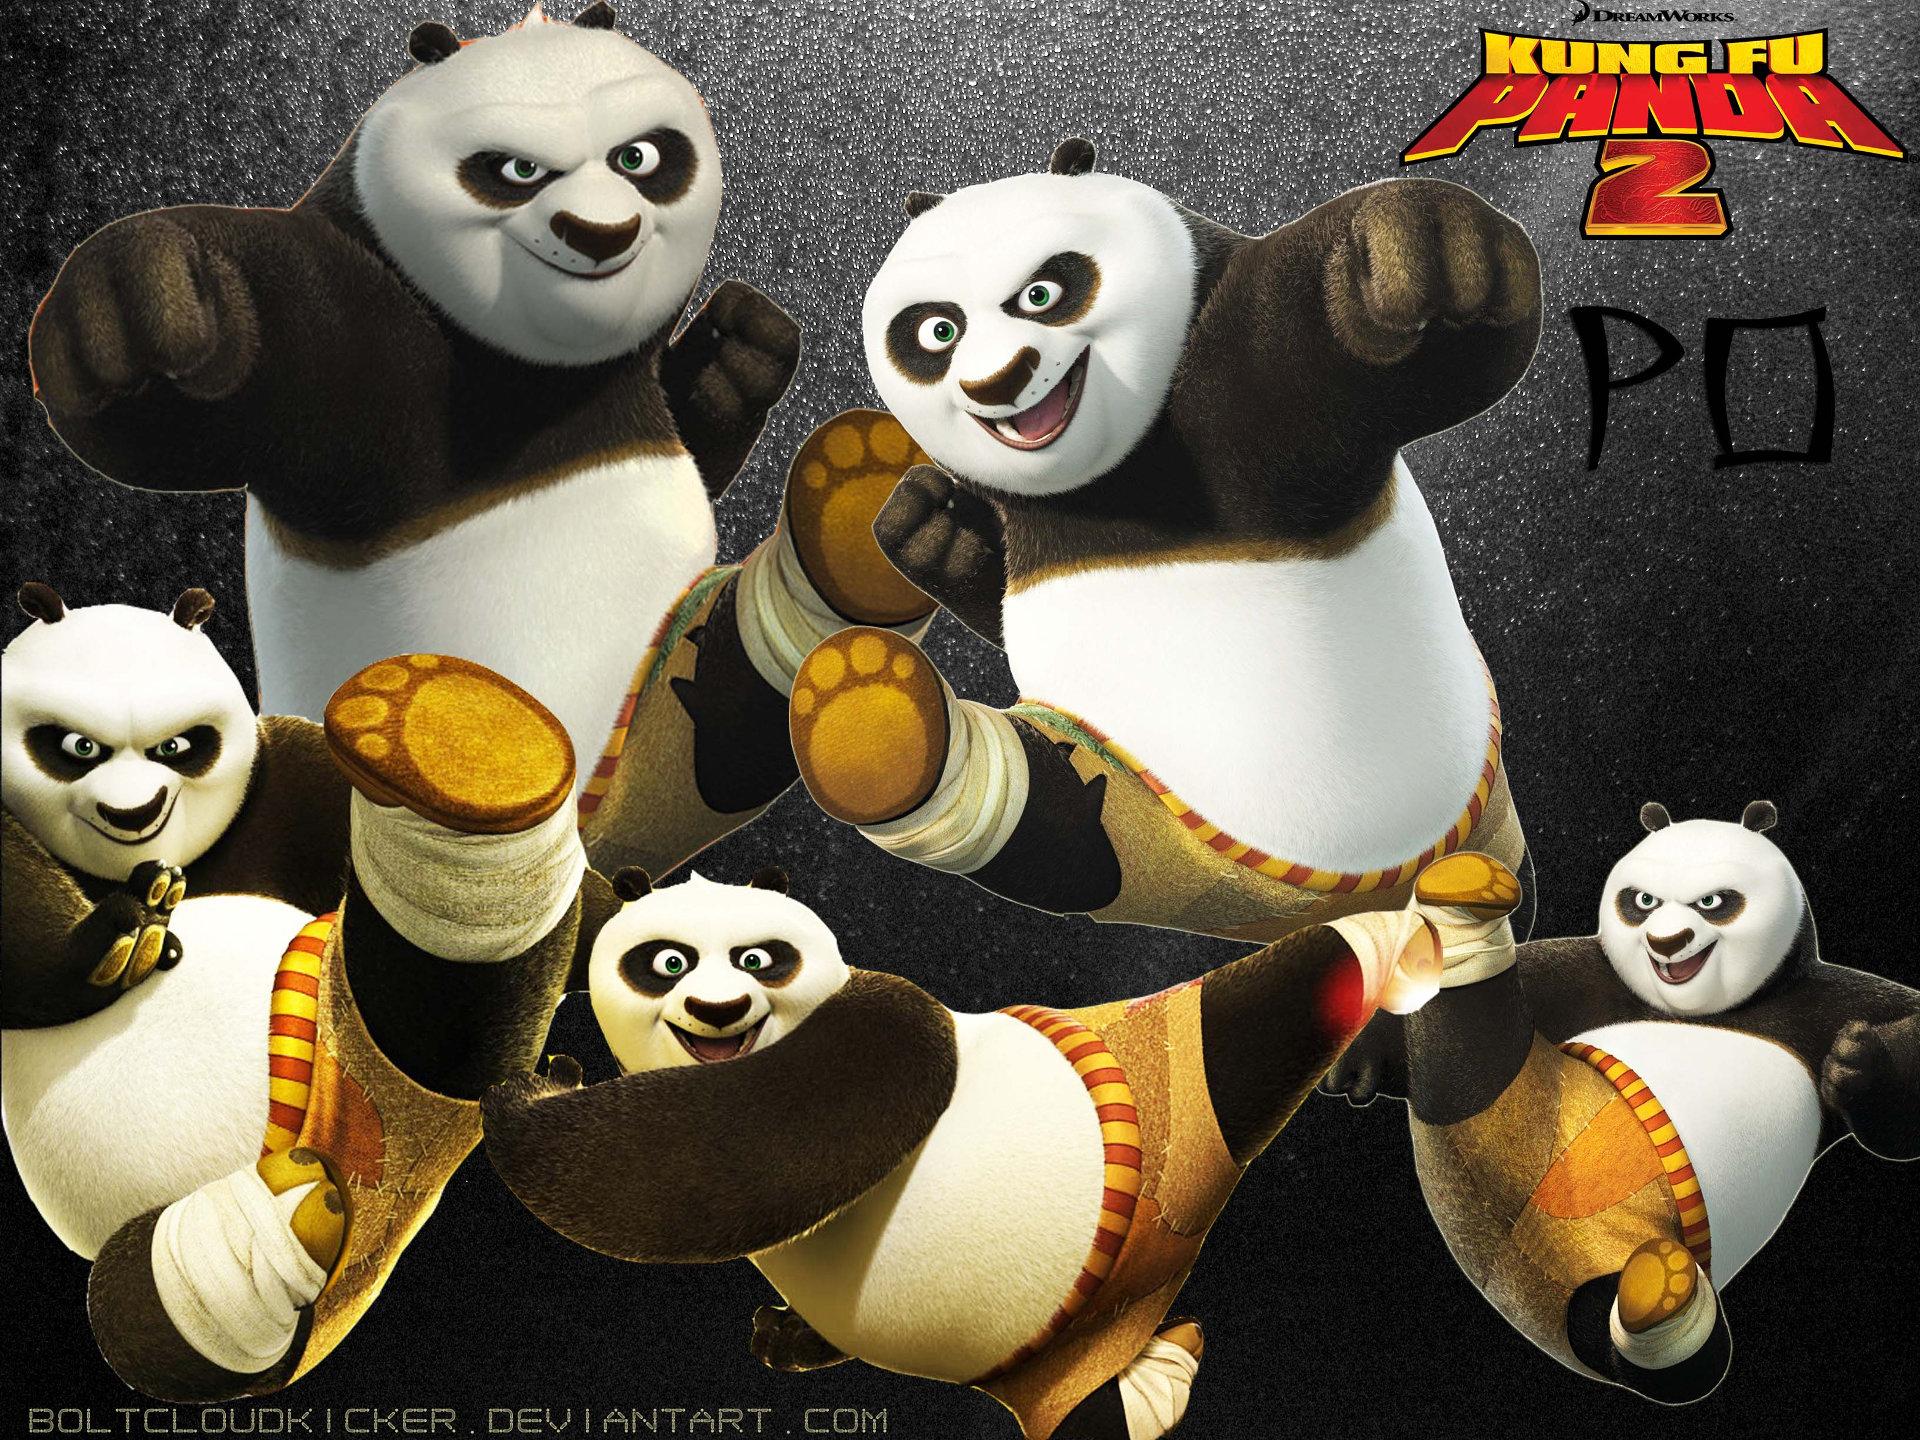 Download Hd 1920x1440 Kung Fu Panda 2 Computer Wallpaper Id 207840